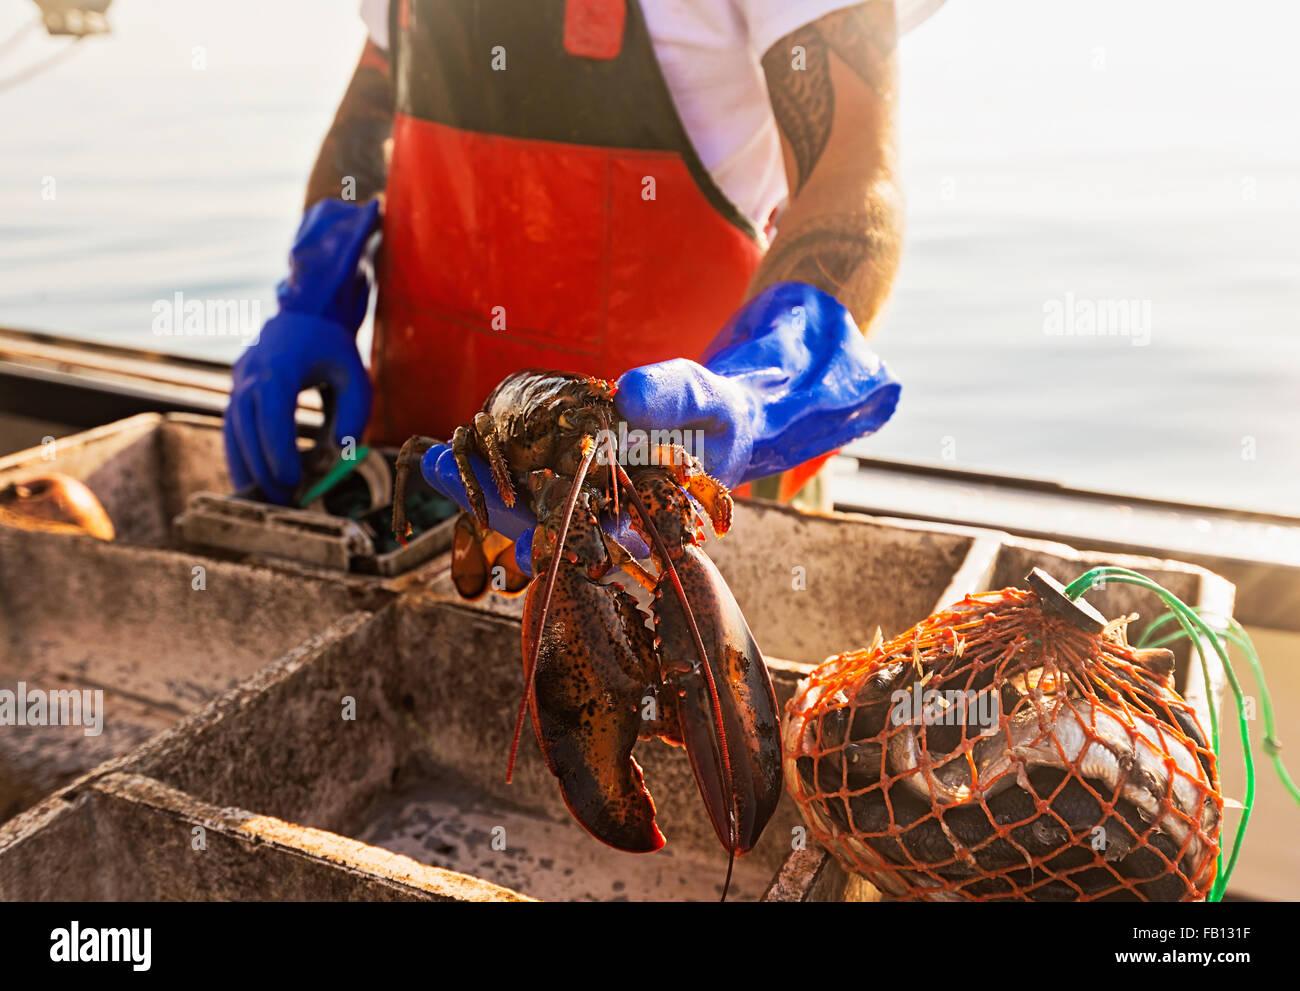 Fisherman holding lobster - Stock Image